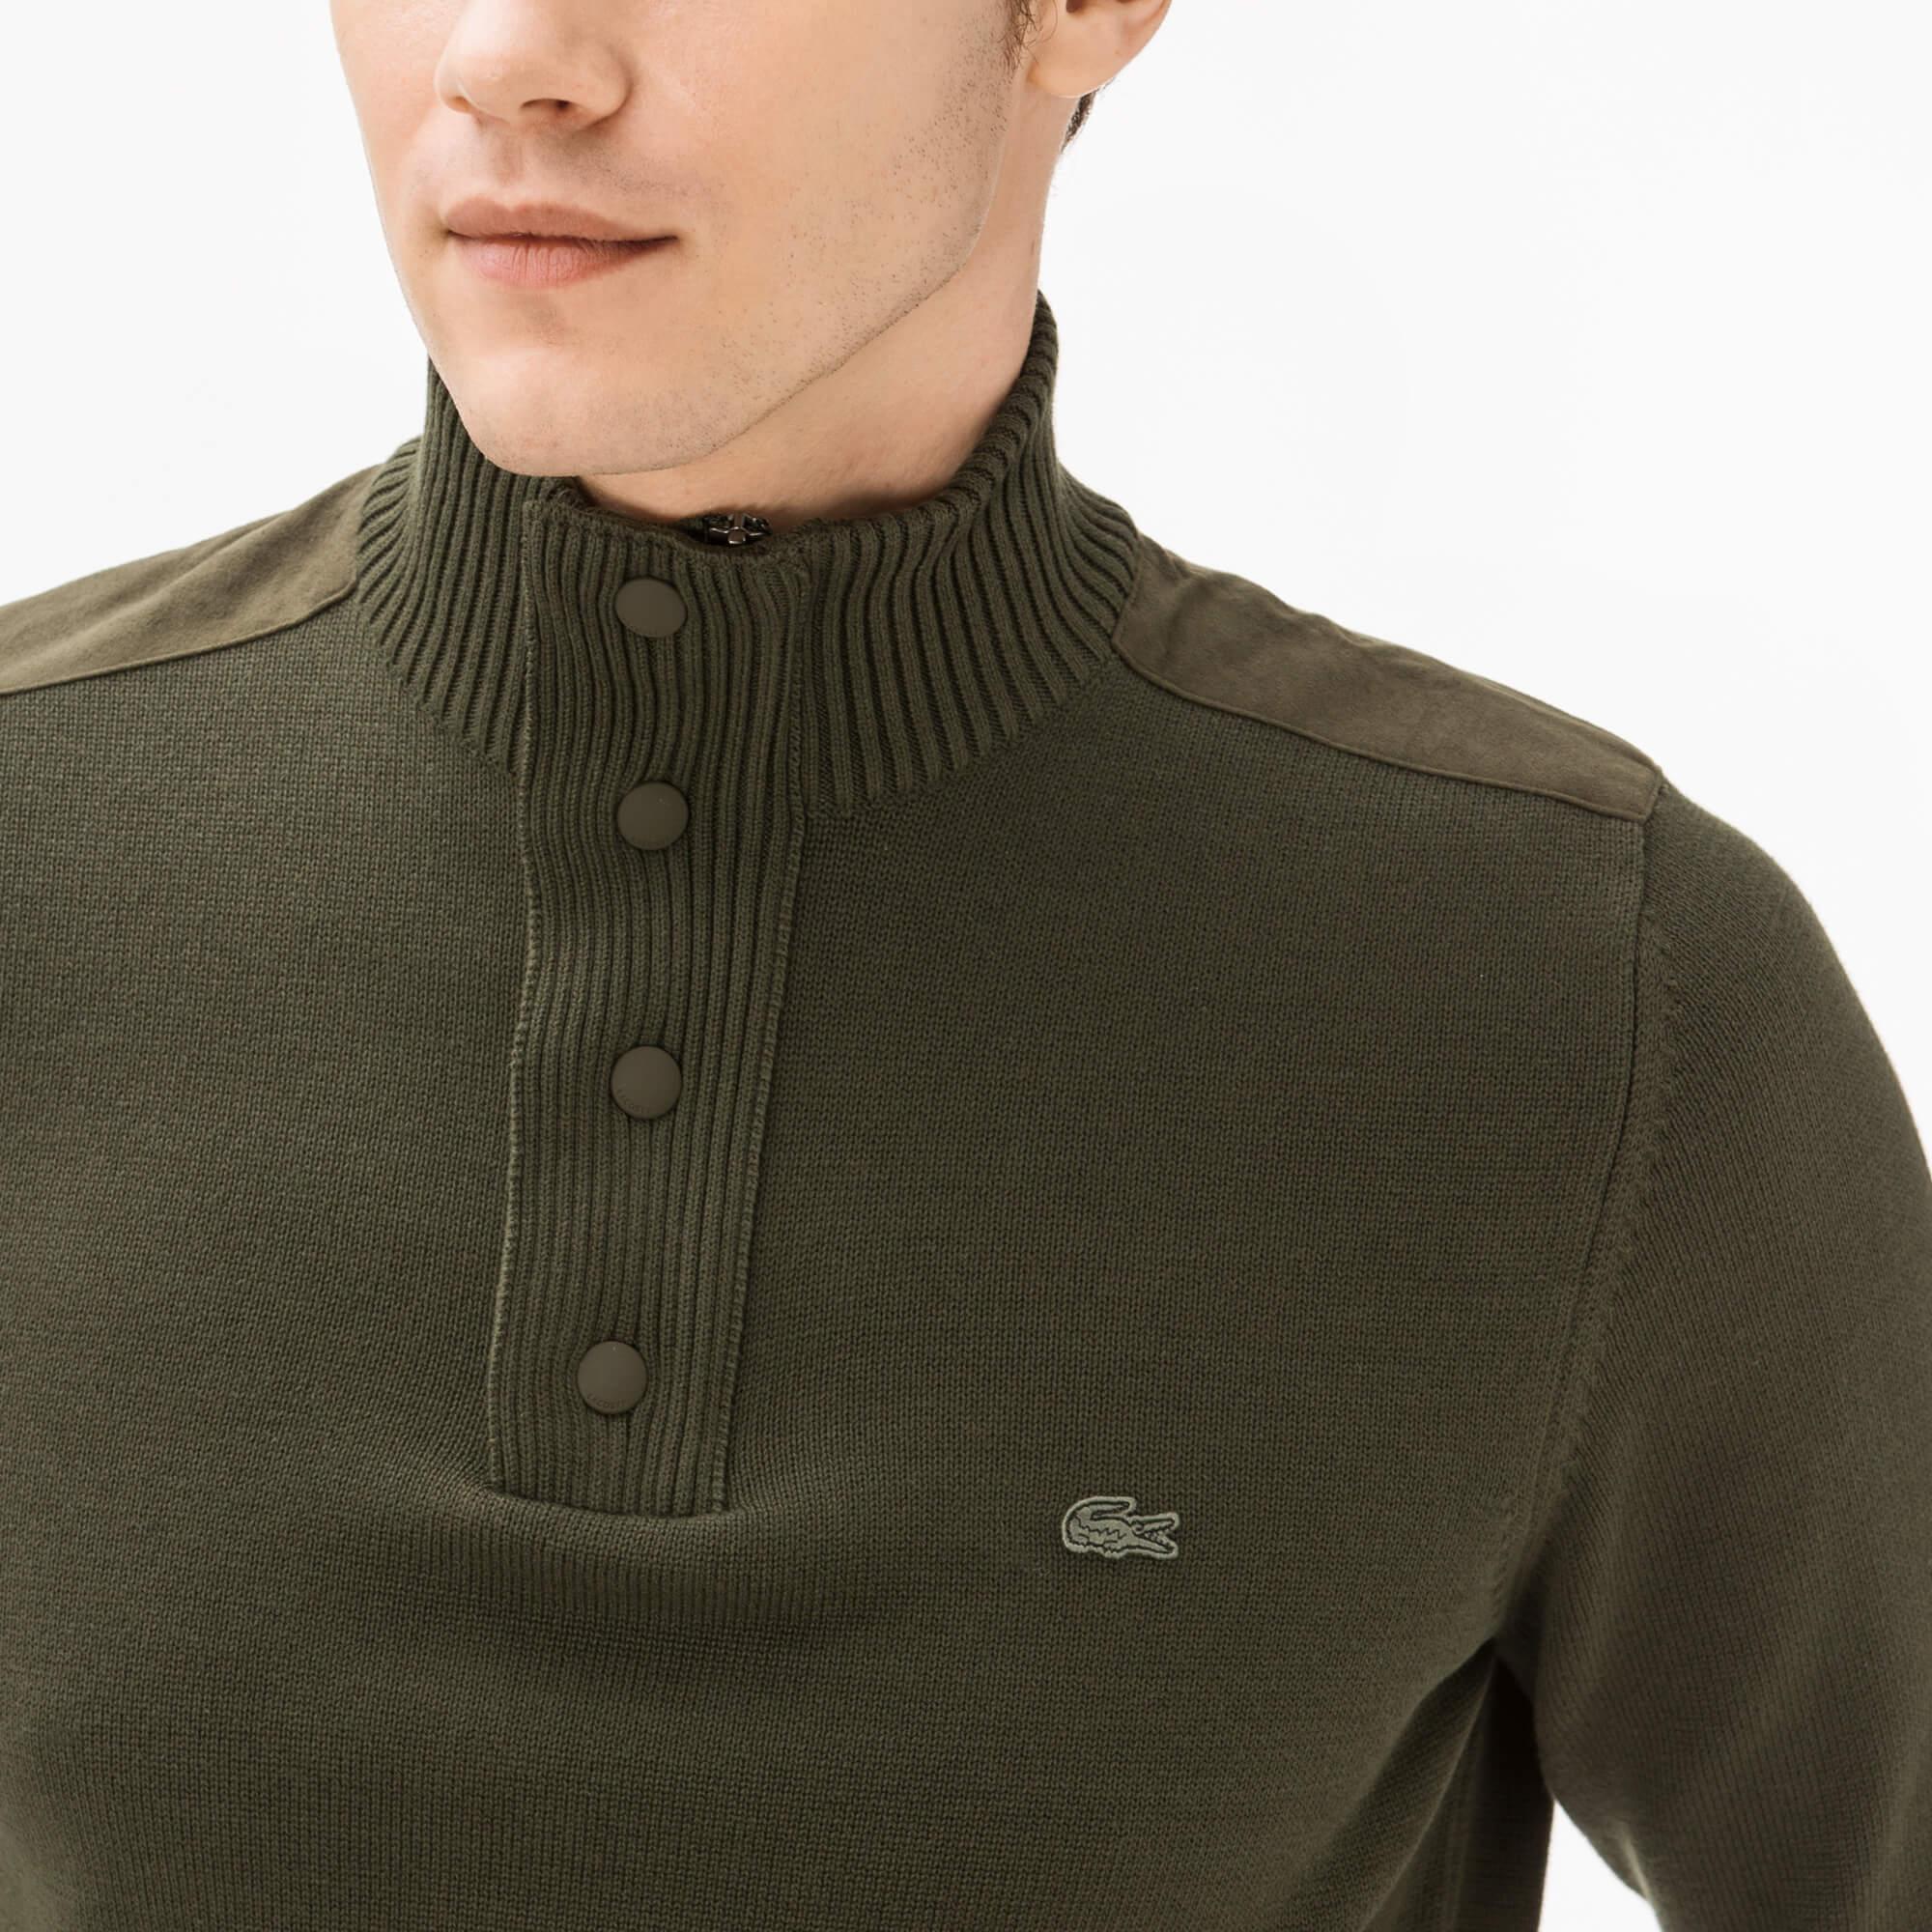 Фото 3 - Мужской свитер Lacoste зеленого цвета